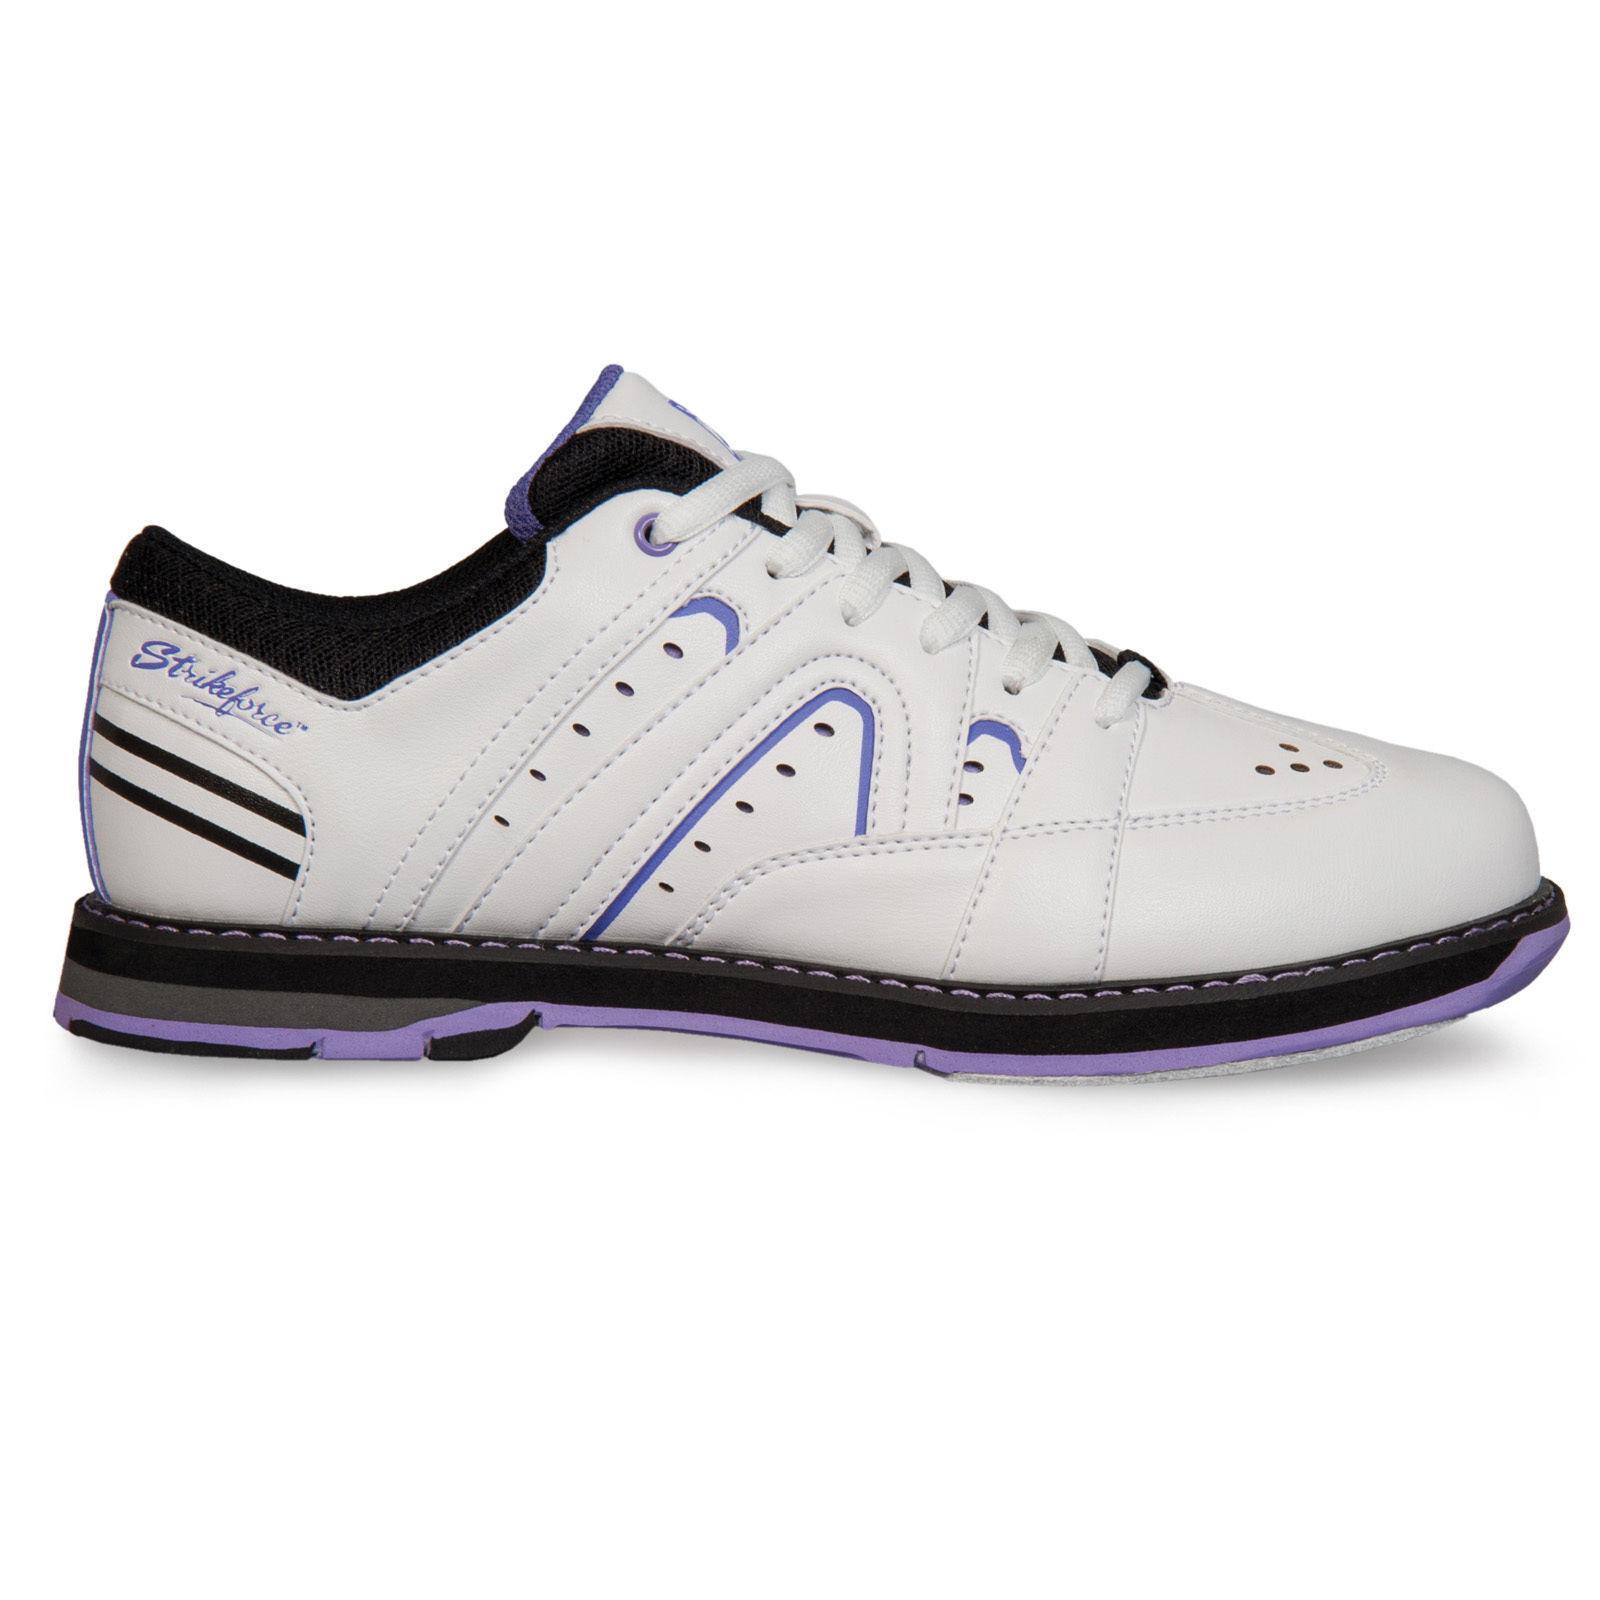 New Women's KR Strikeforce Quest White Purple Bowling shoes Size 7